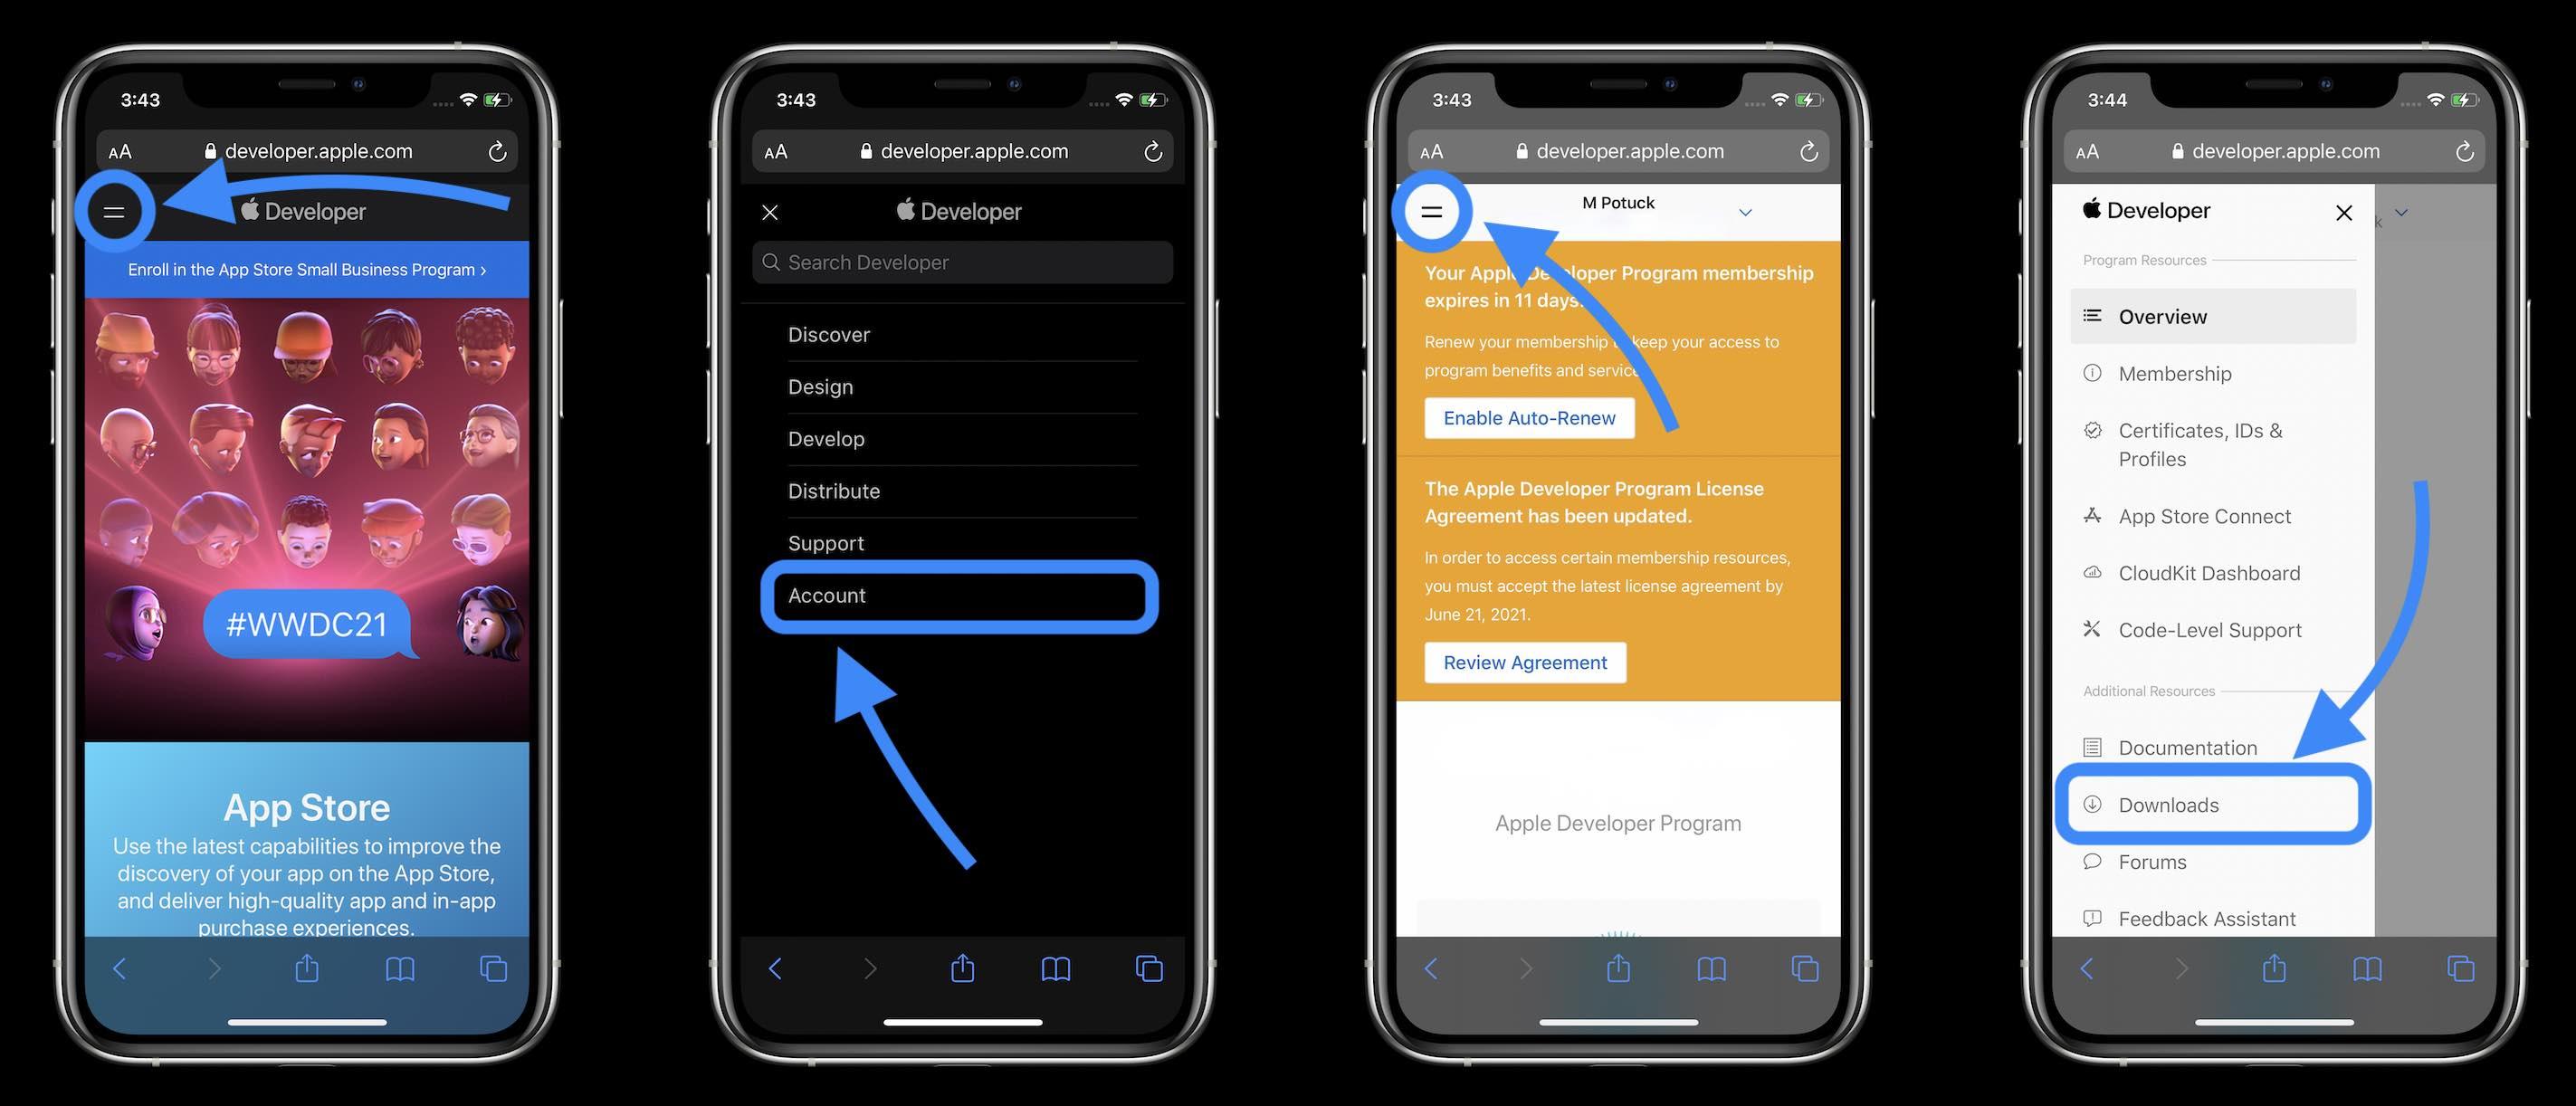 How to install iOS 15 beta - walkthrough 1